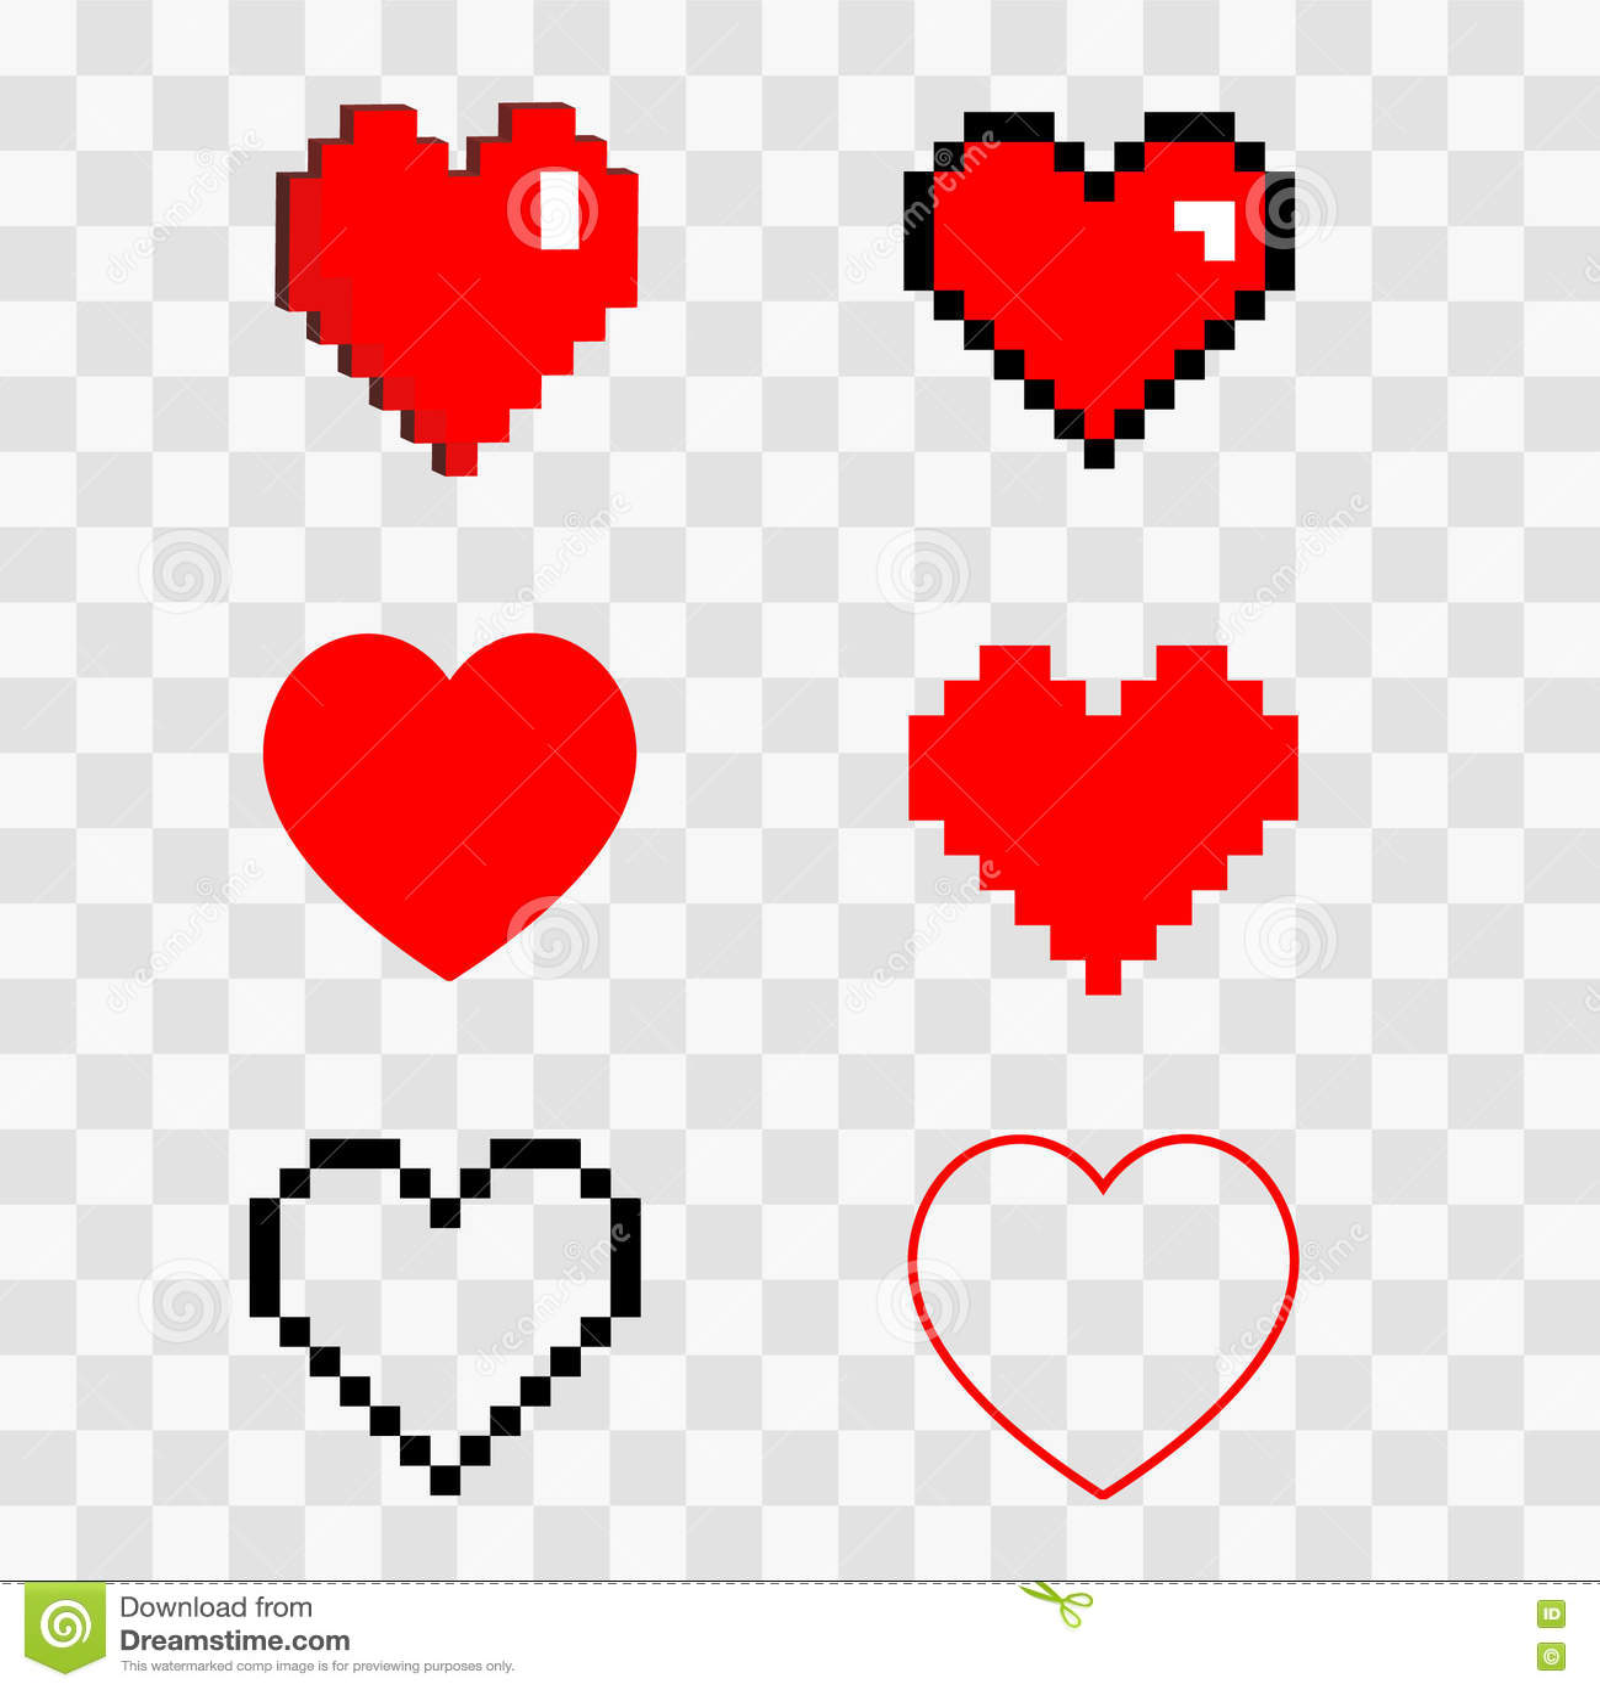 8 bit heart free vector download 4603 Free vector for